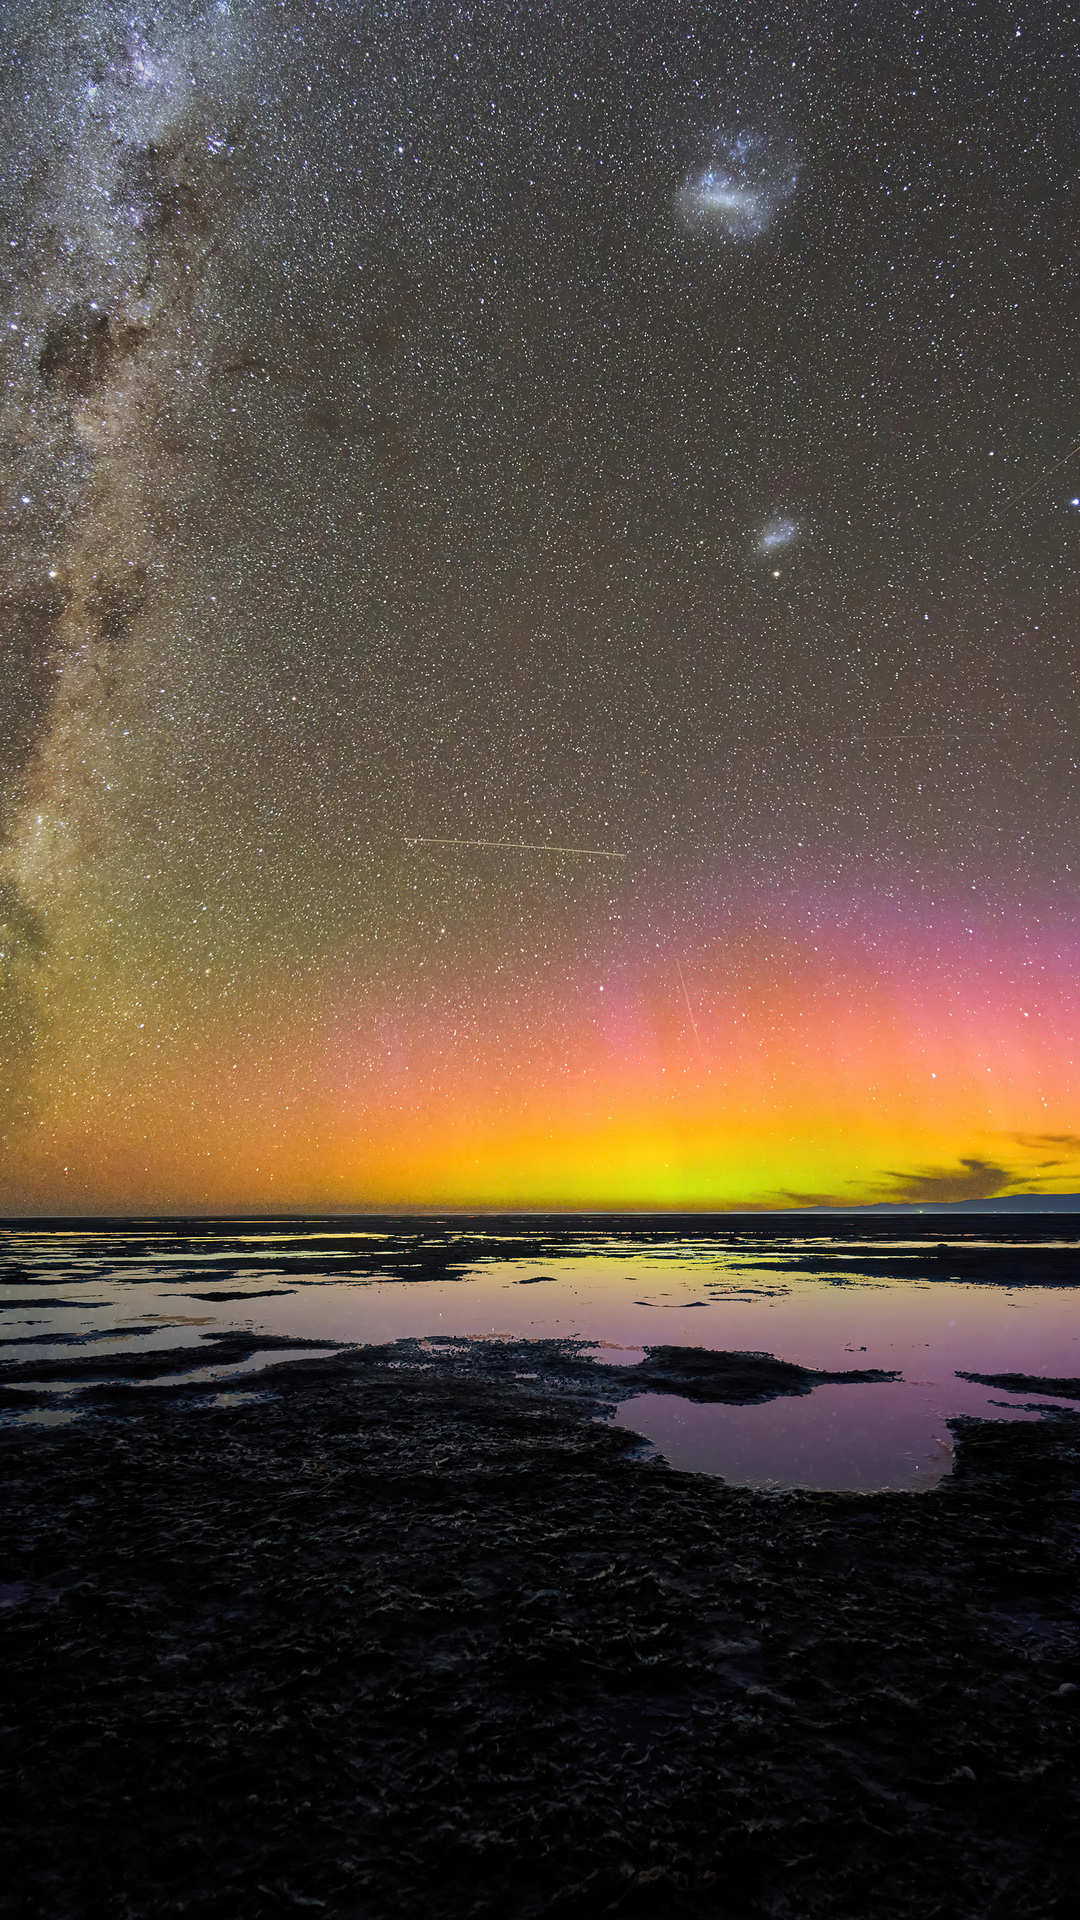 aurora-australis-over-birdlings-flat-new-zealand-5k-o6.jpg